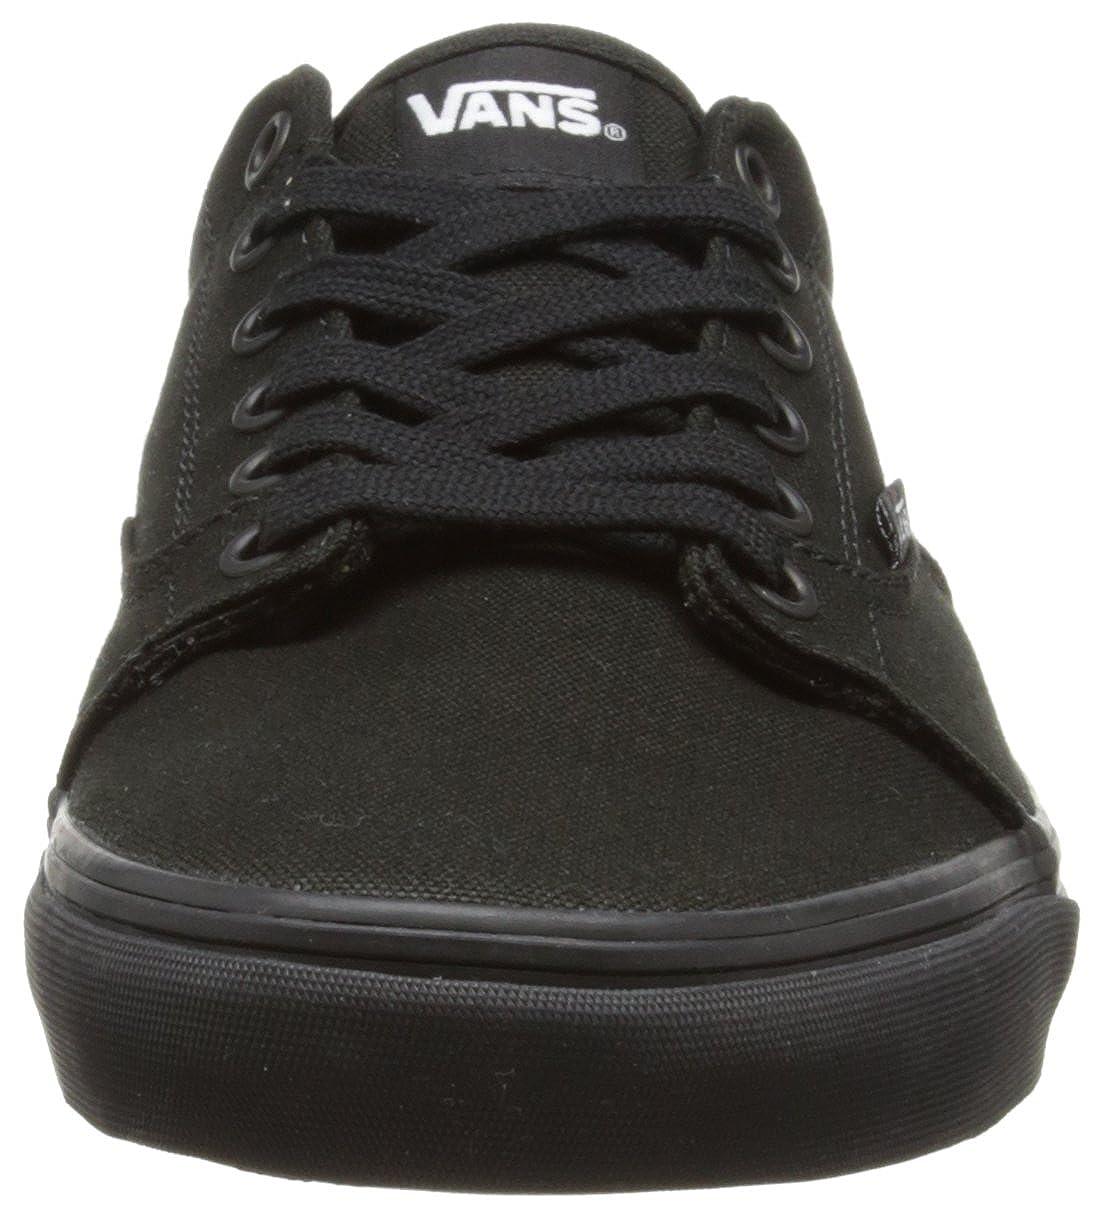 Vans Kress Schwarz (Canvas) VNLH8J7 Herren Sneaker Schwarz Kress (schwarz/schwarz) b86a66